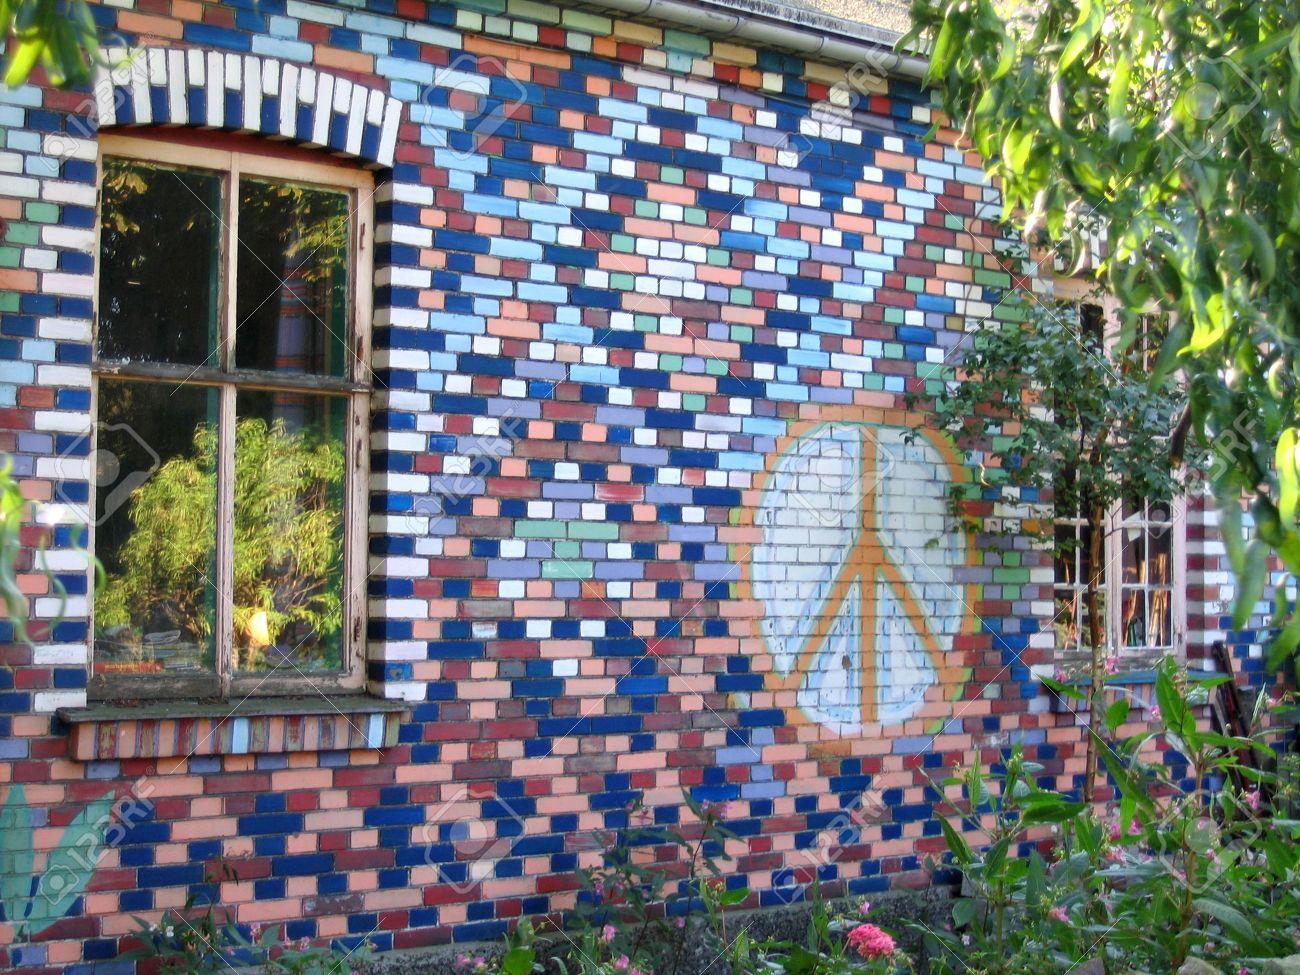 2602567-Graffiti-on-bricks-wall-in-Freetown-Christiania-Copenhagen-Denmark-Stock-Photo